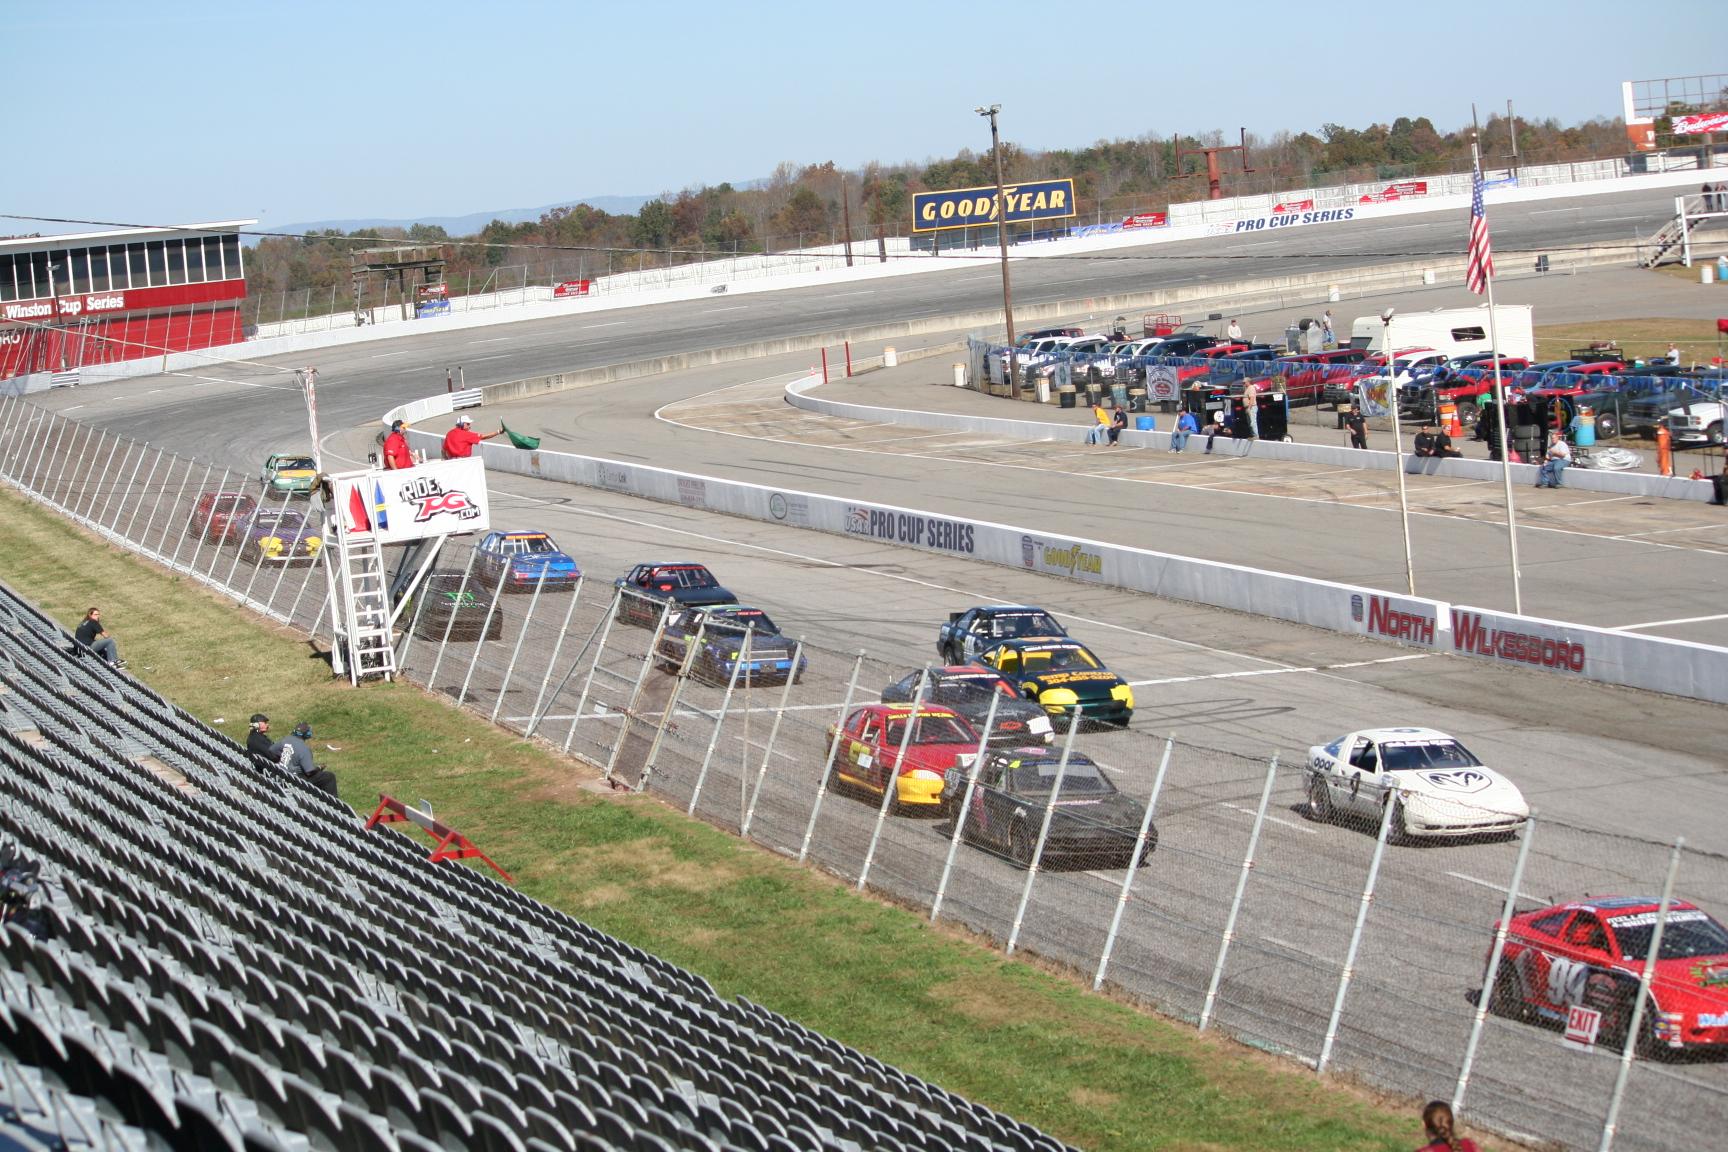 North Wilkesboro Speedway - Wikipedia